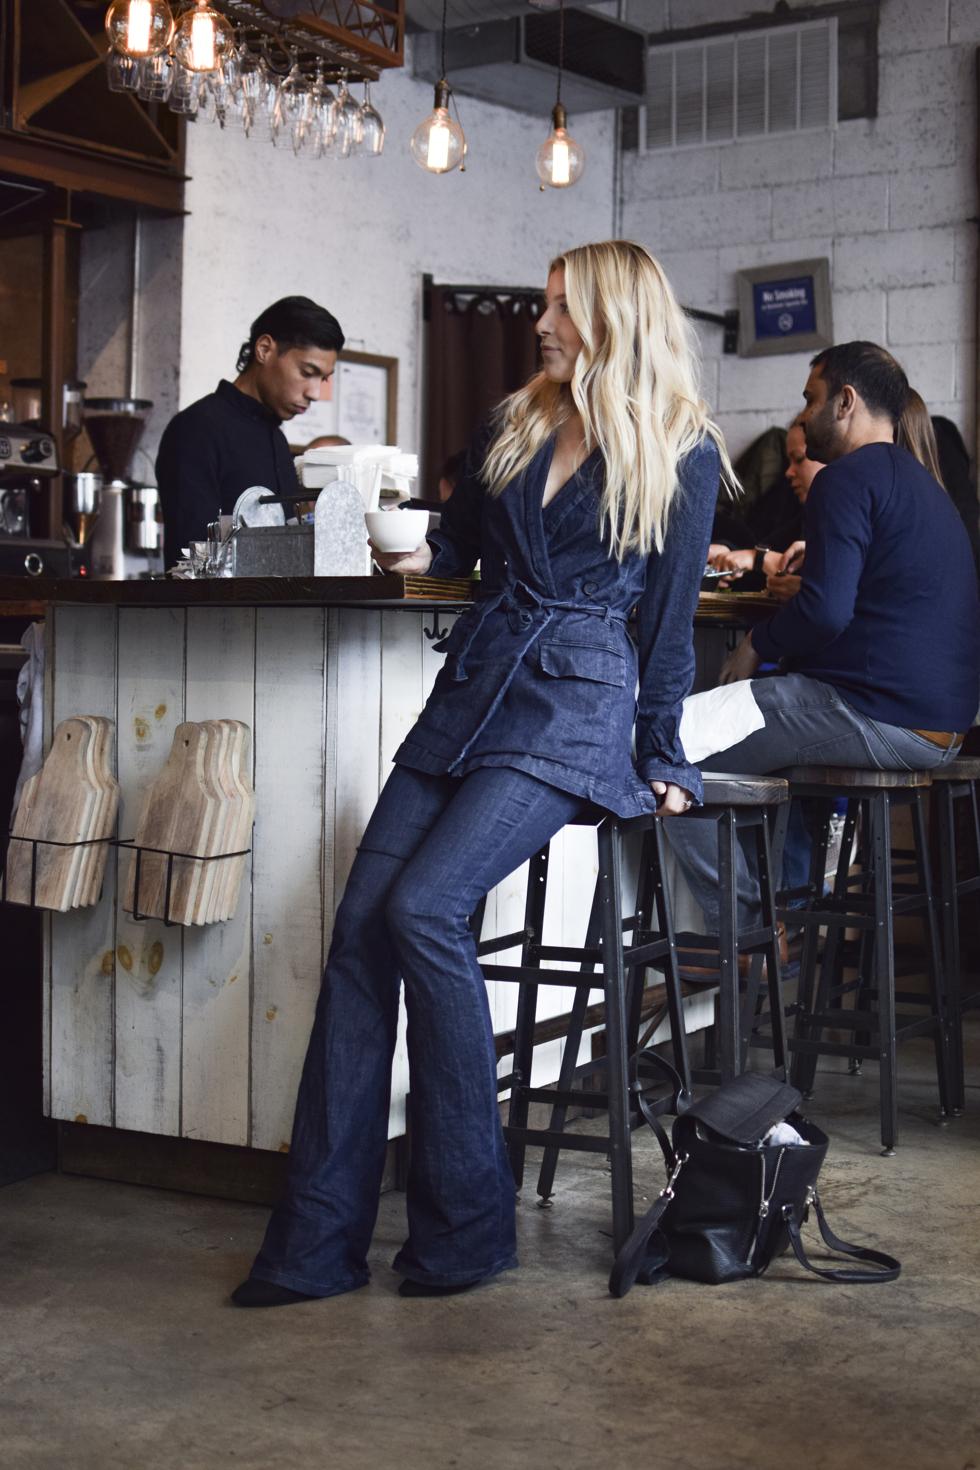 sanne_rustic_table_new_york_4